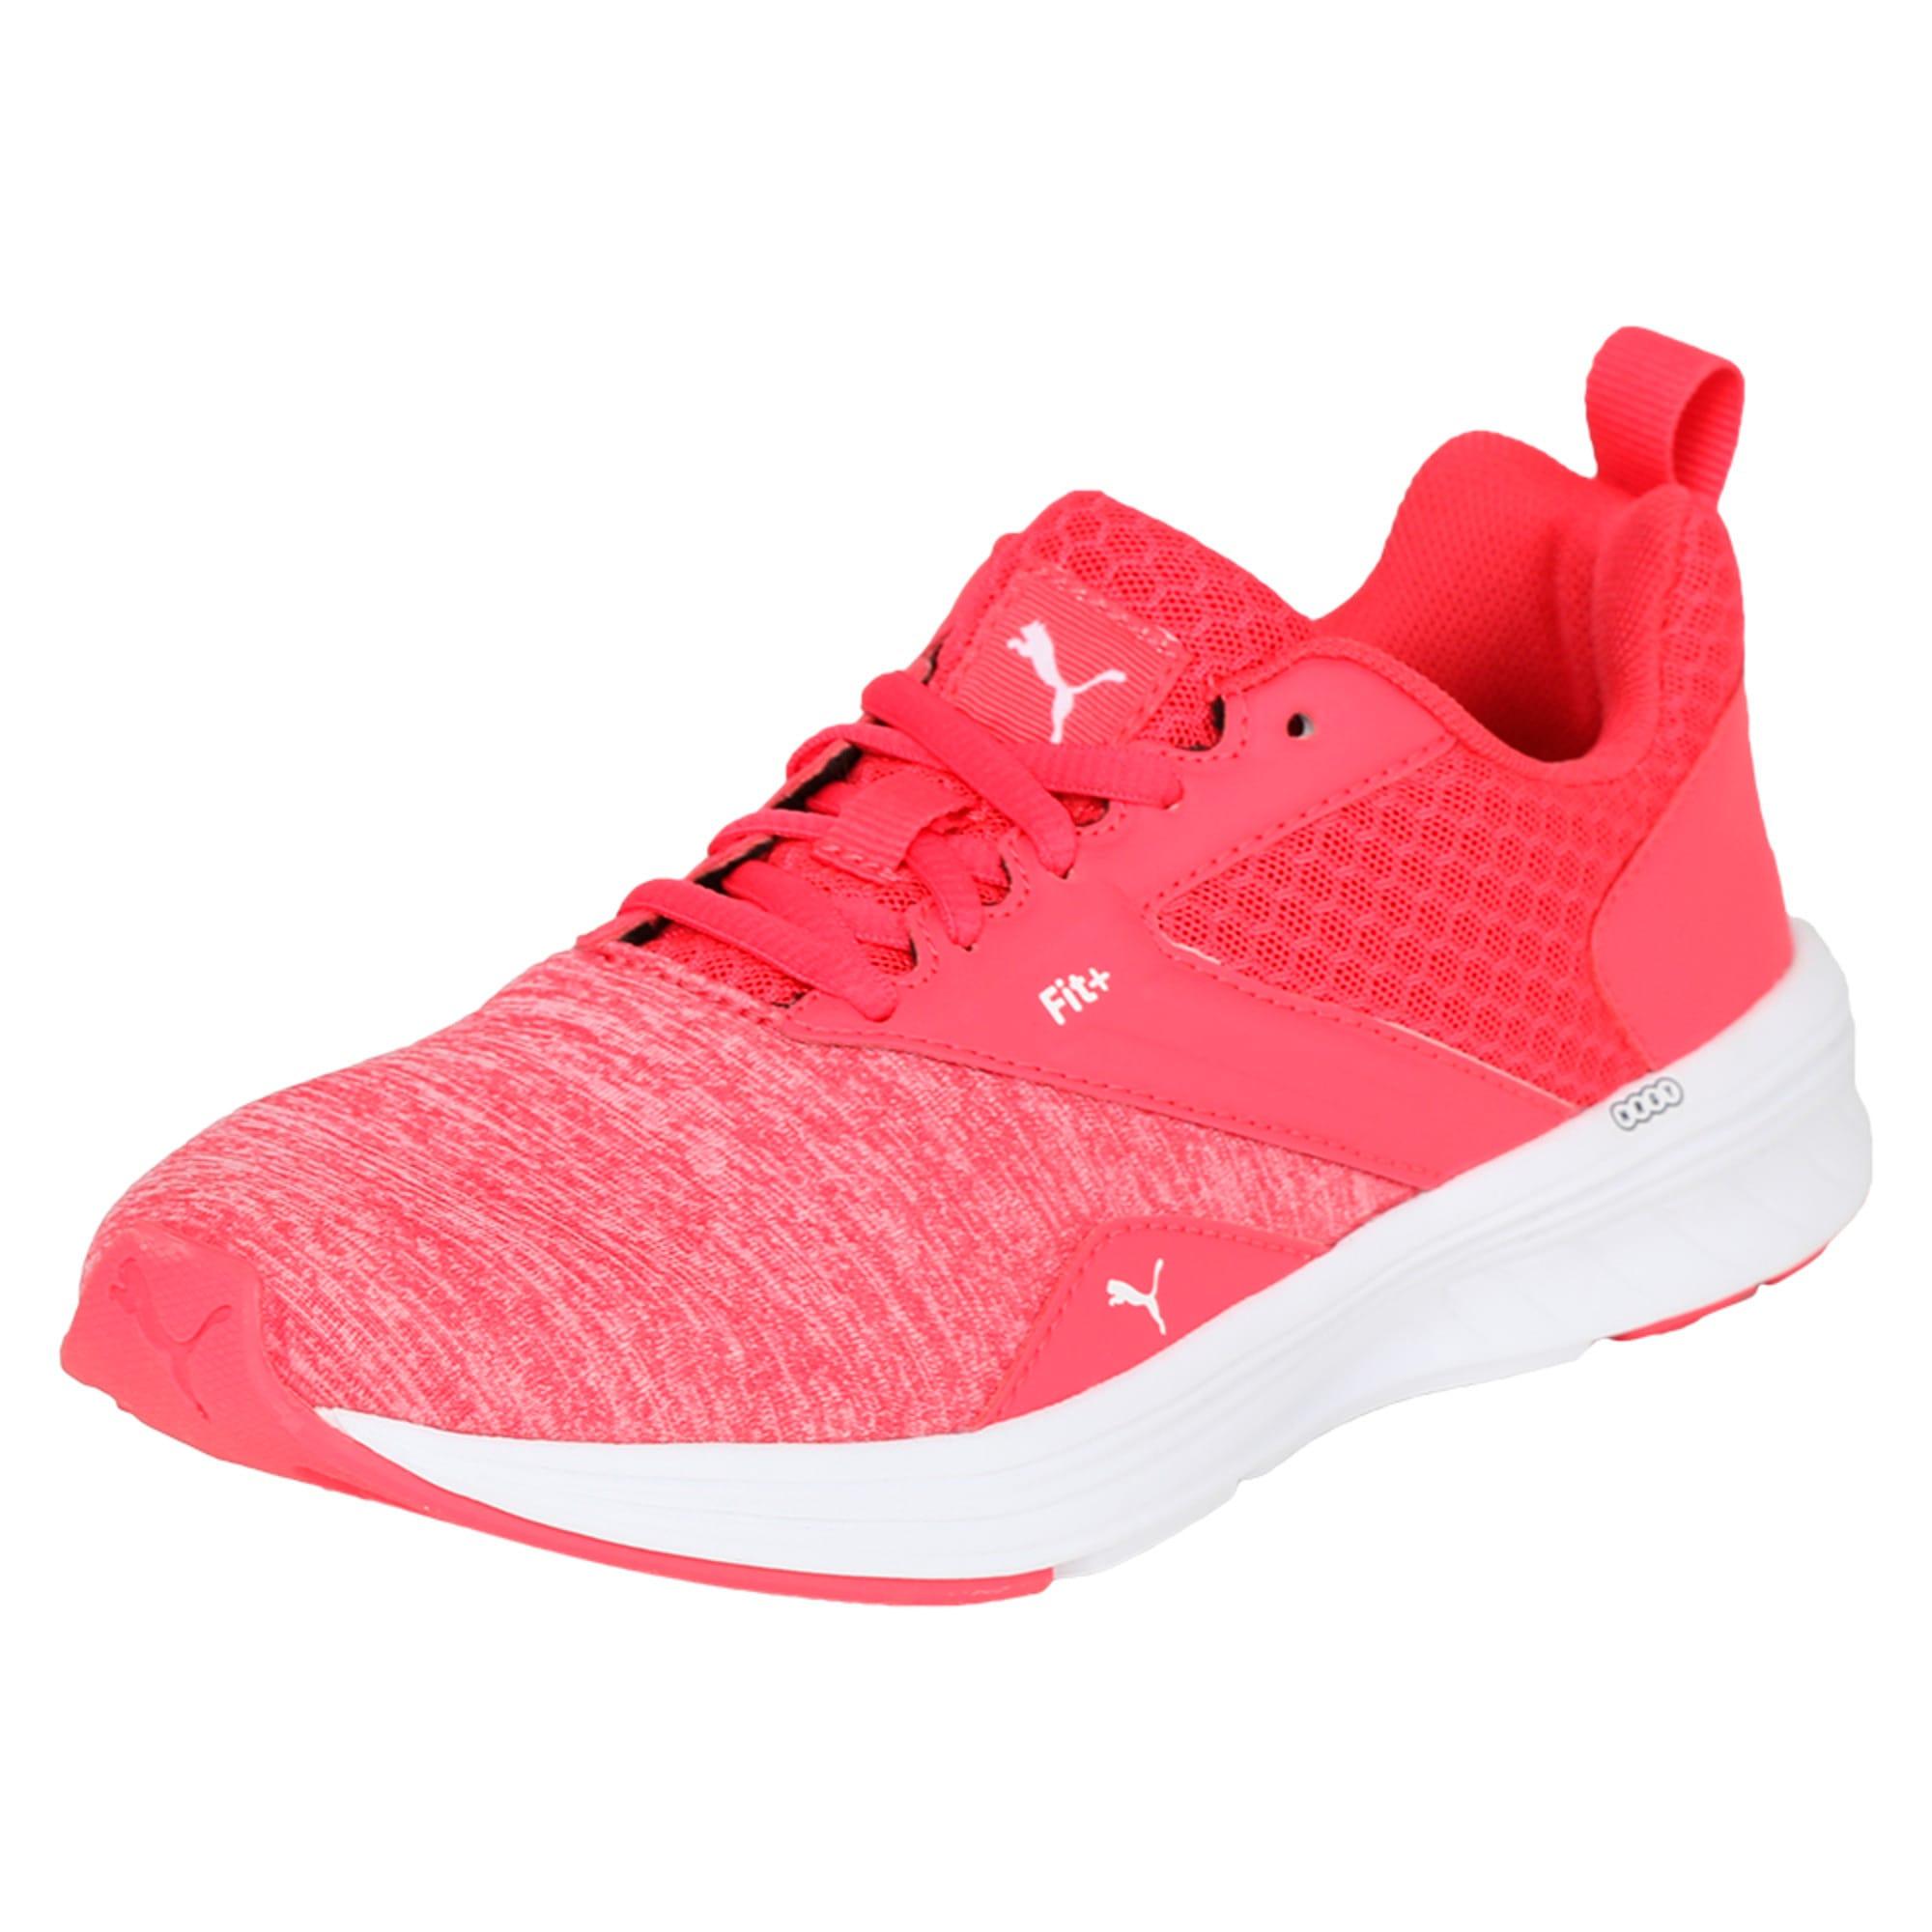 Thumbnail 1 of NRGY Comet Kids' Training Shoes, White-Paradise Pink-White, medium-IND